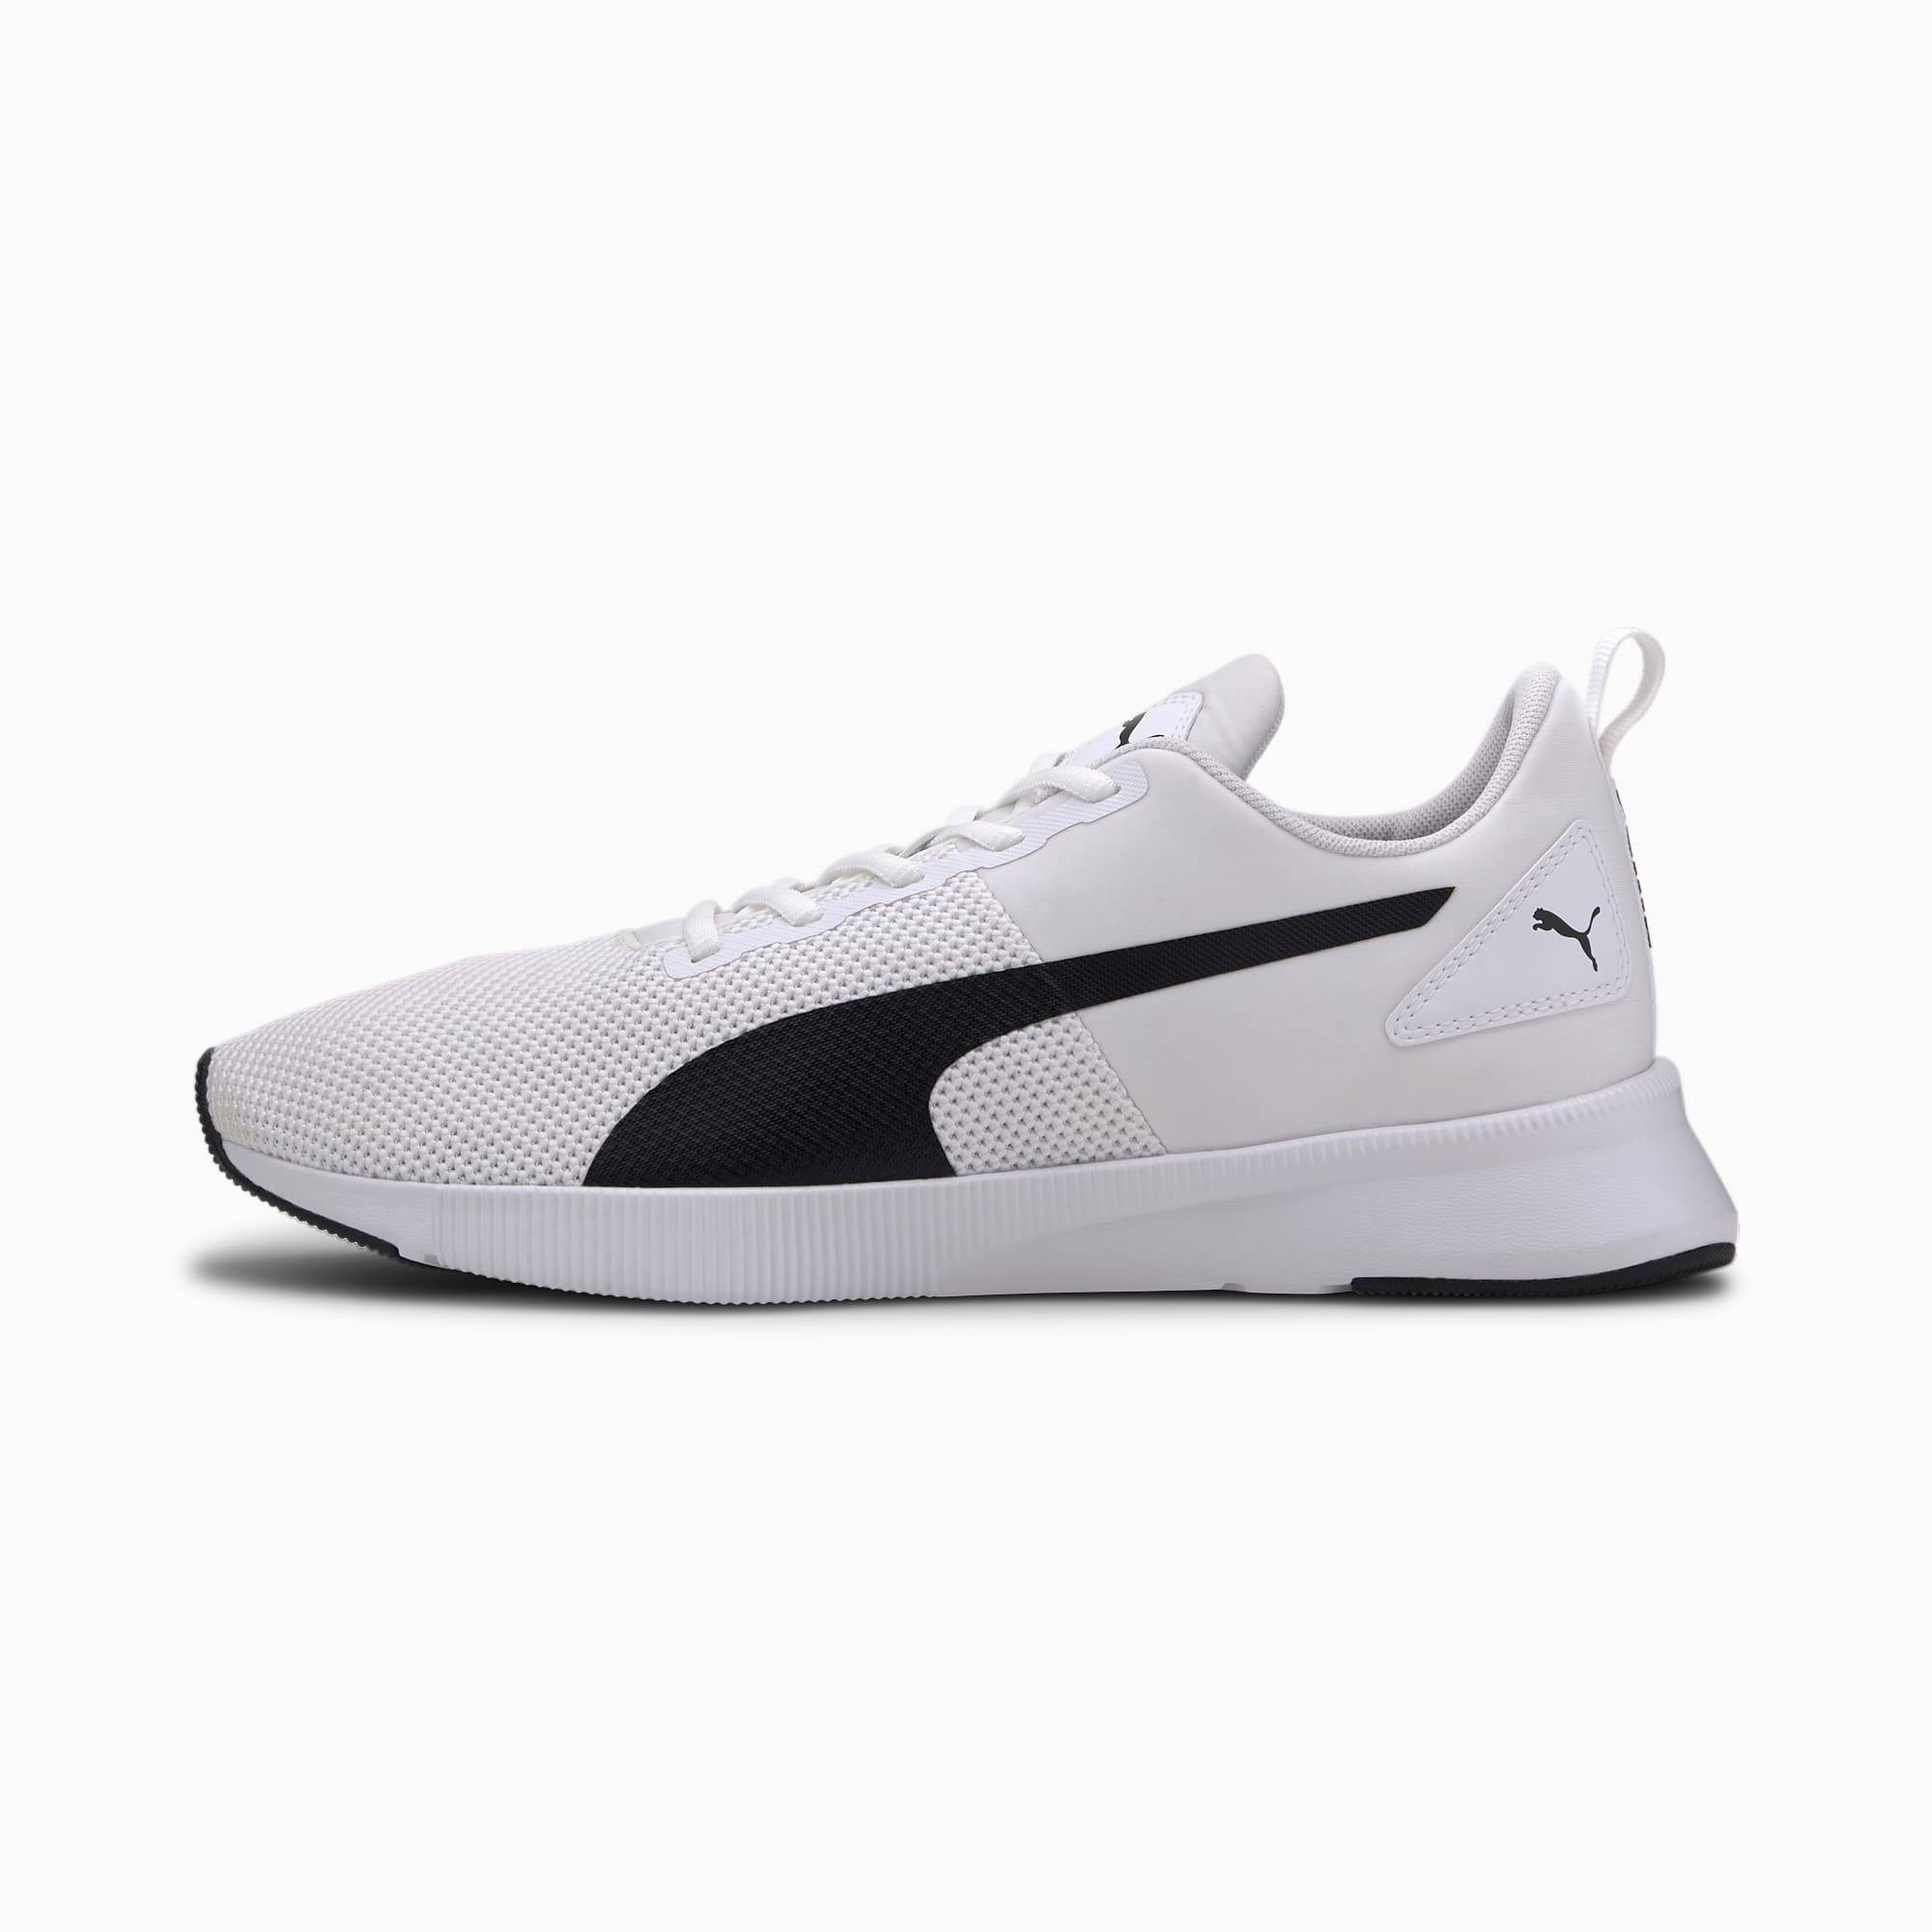 PUMA Chaussure de course Flyer Runner, Blanc/Noir, Taille 47, Chaussures